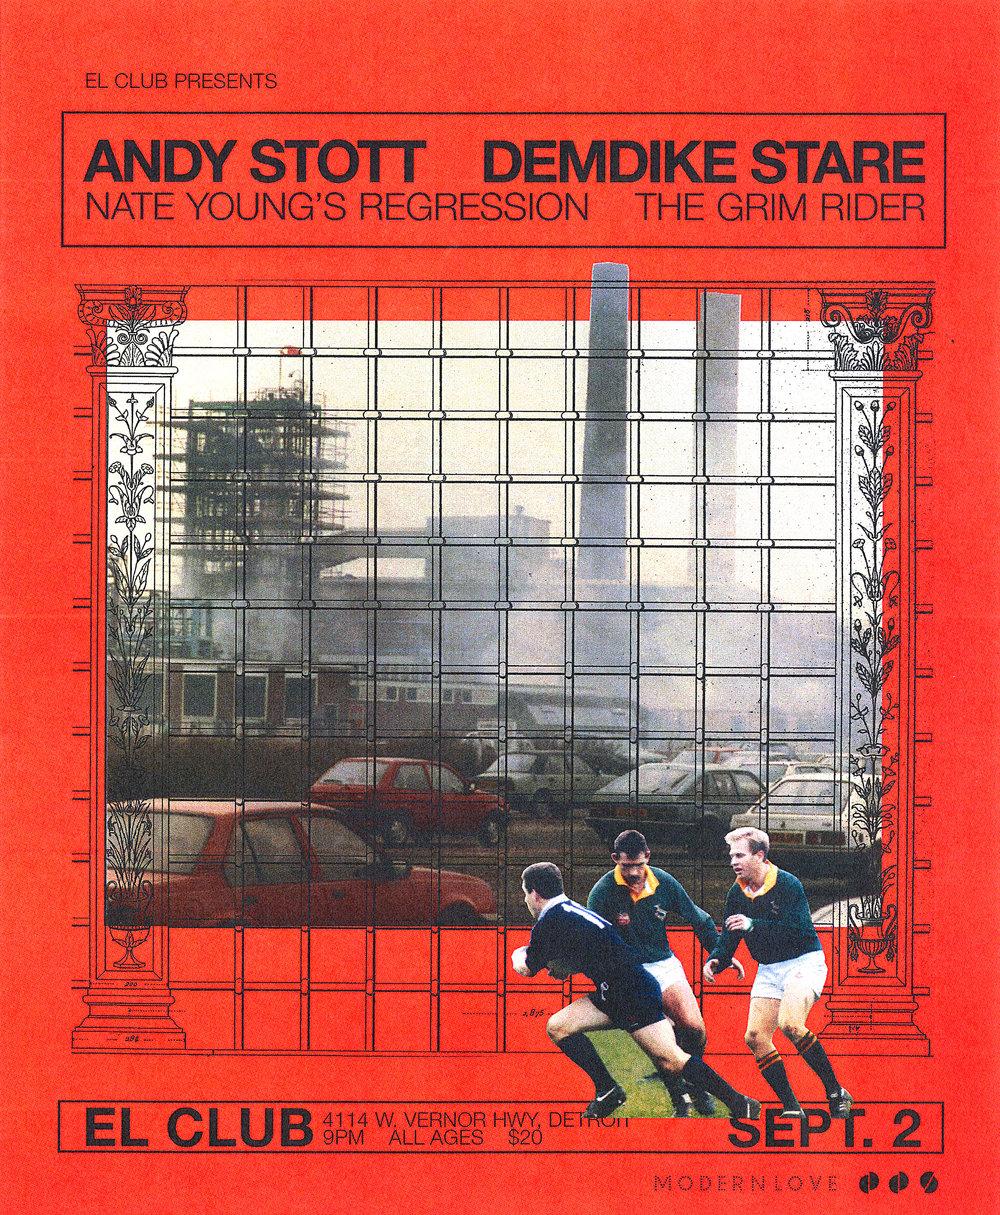 andy-stott-demdike-stare-web_2000.jpg